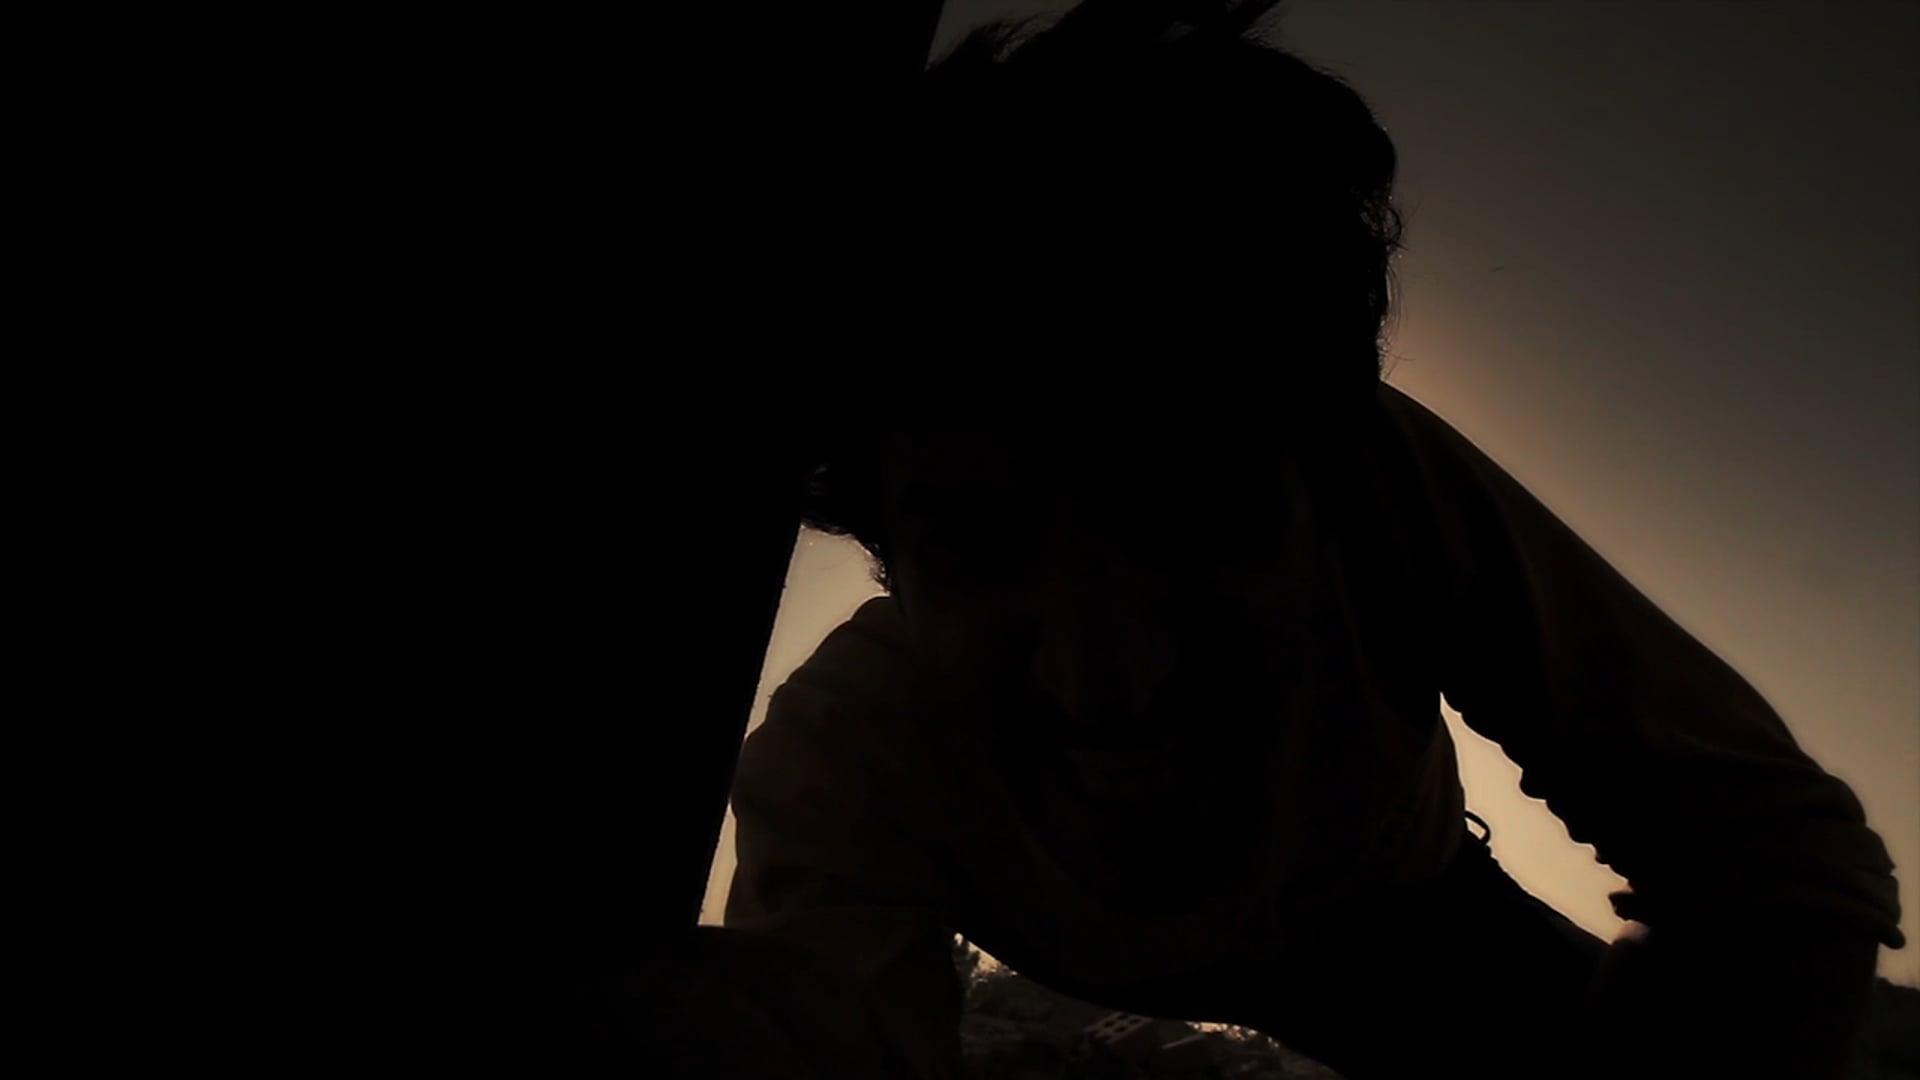 Collapse vimeo